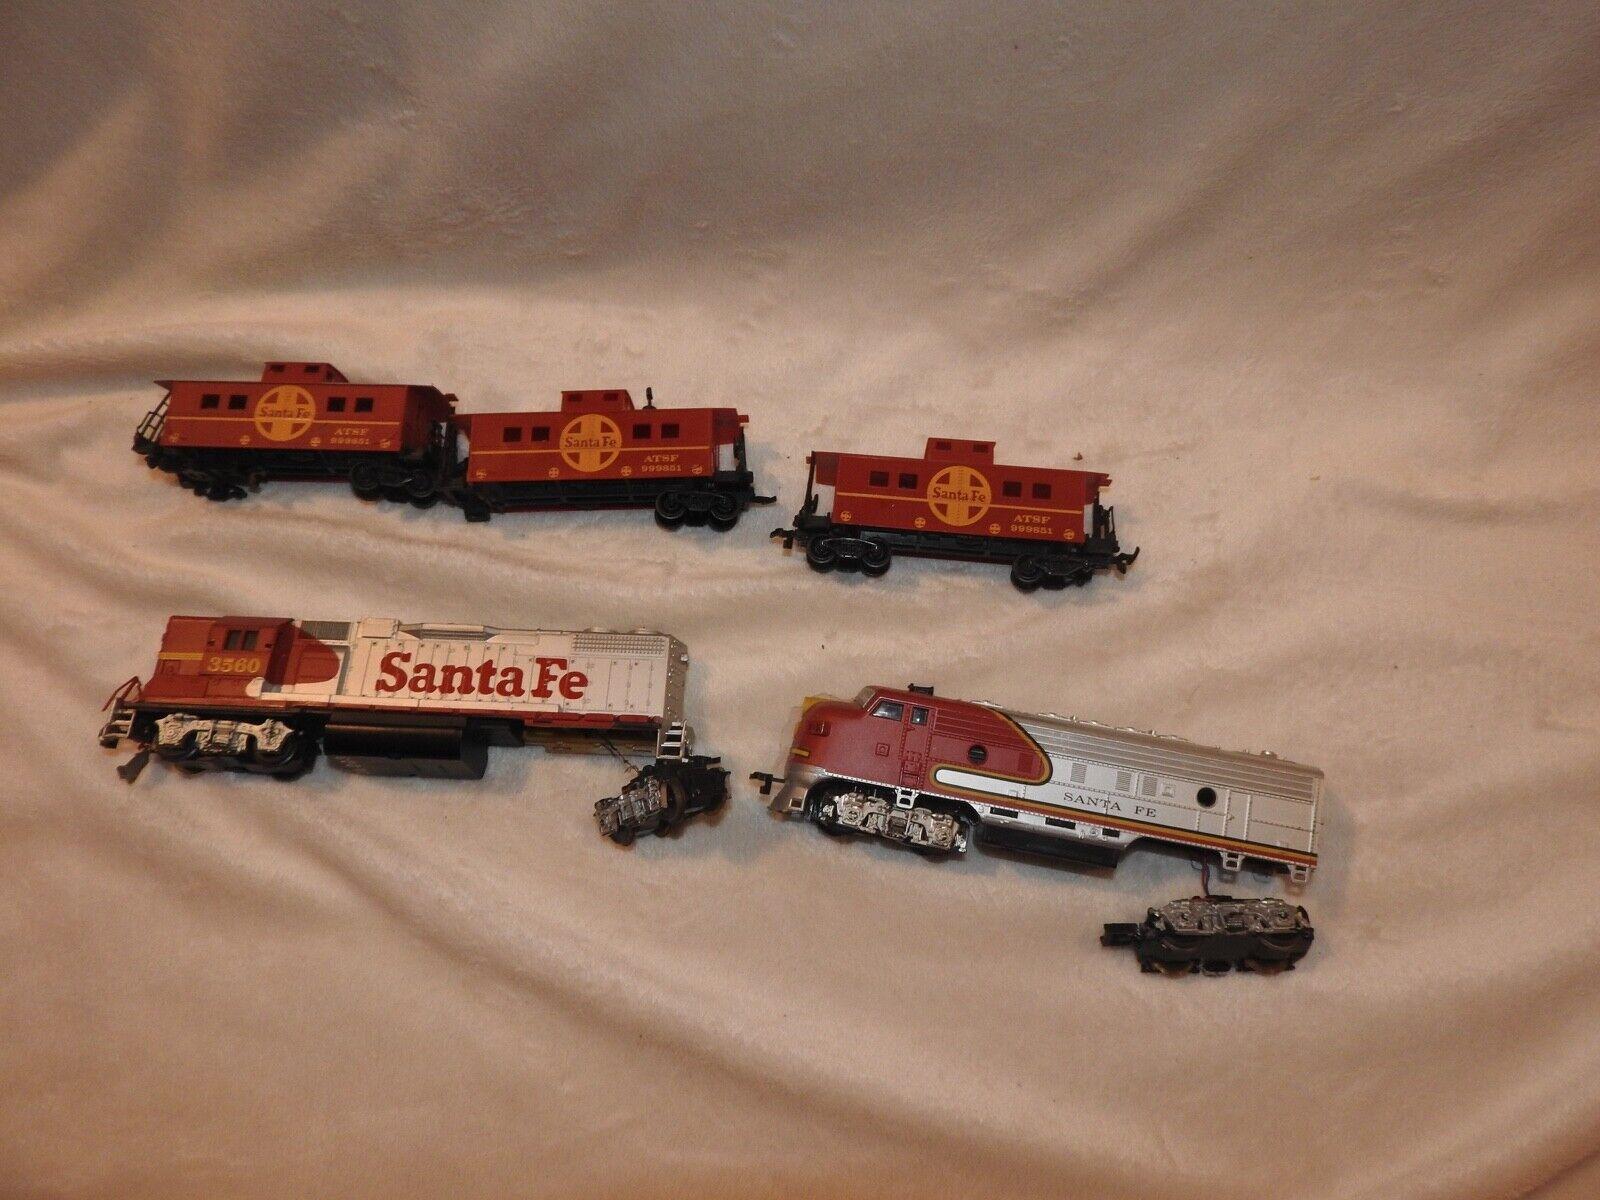 Santa Fe Engines (2)  Caboose (3)  REPAIR PARTS